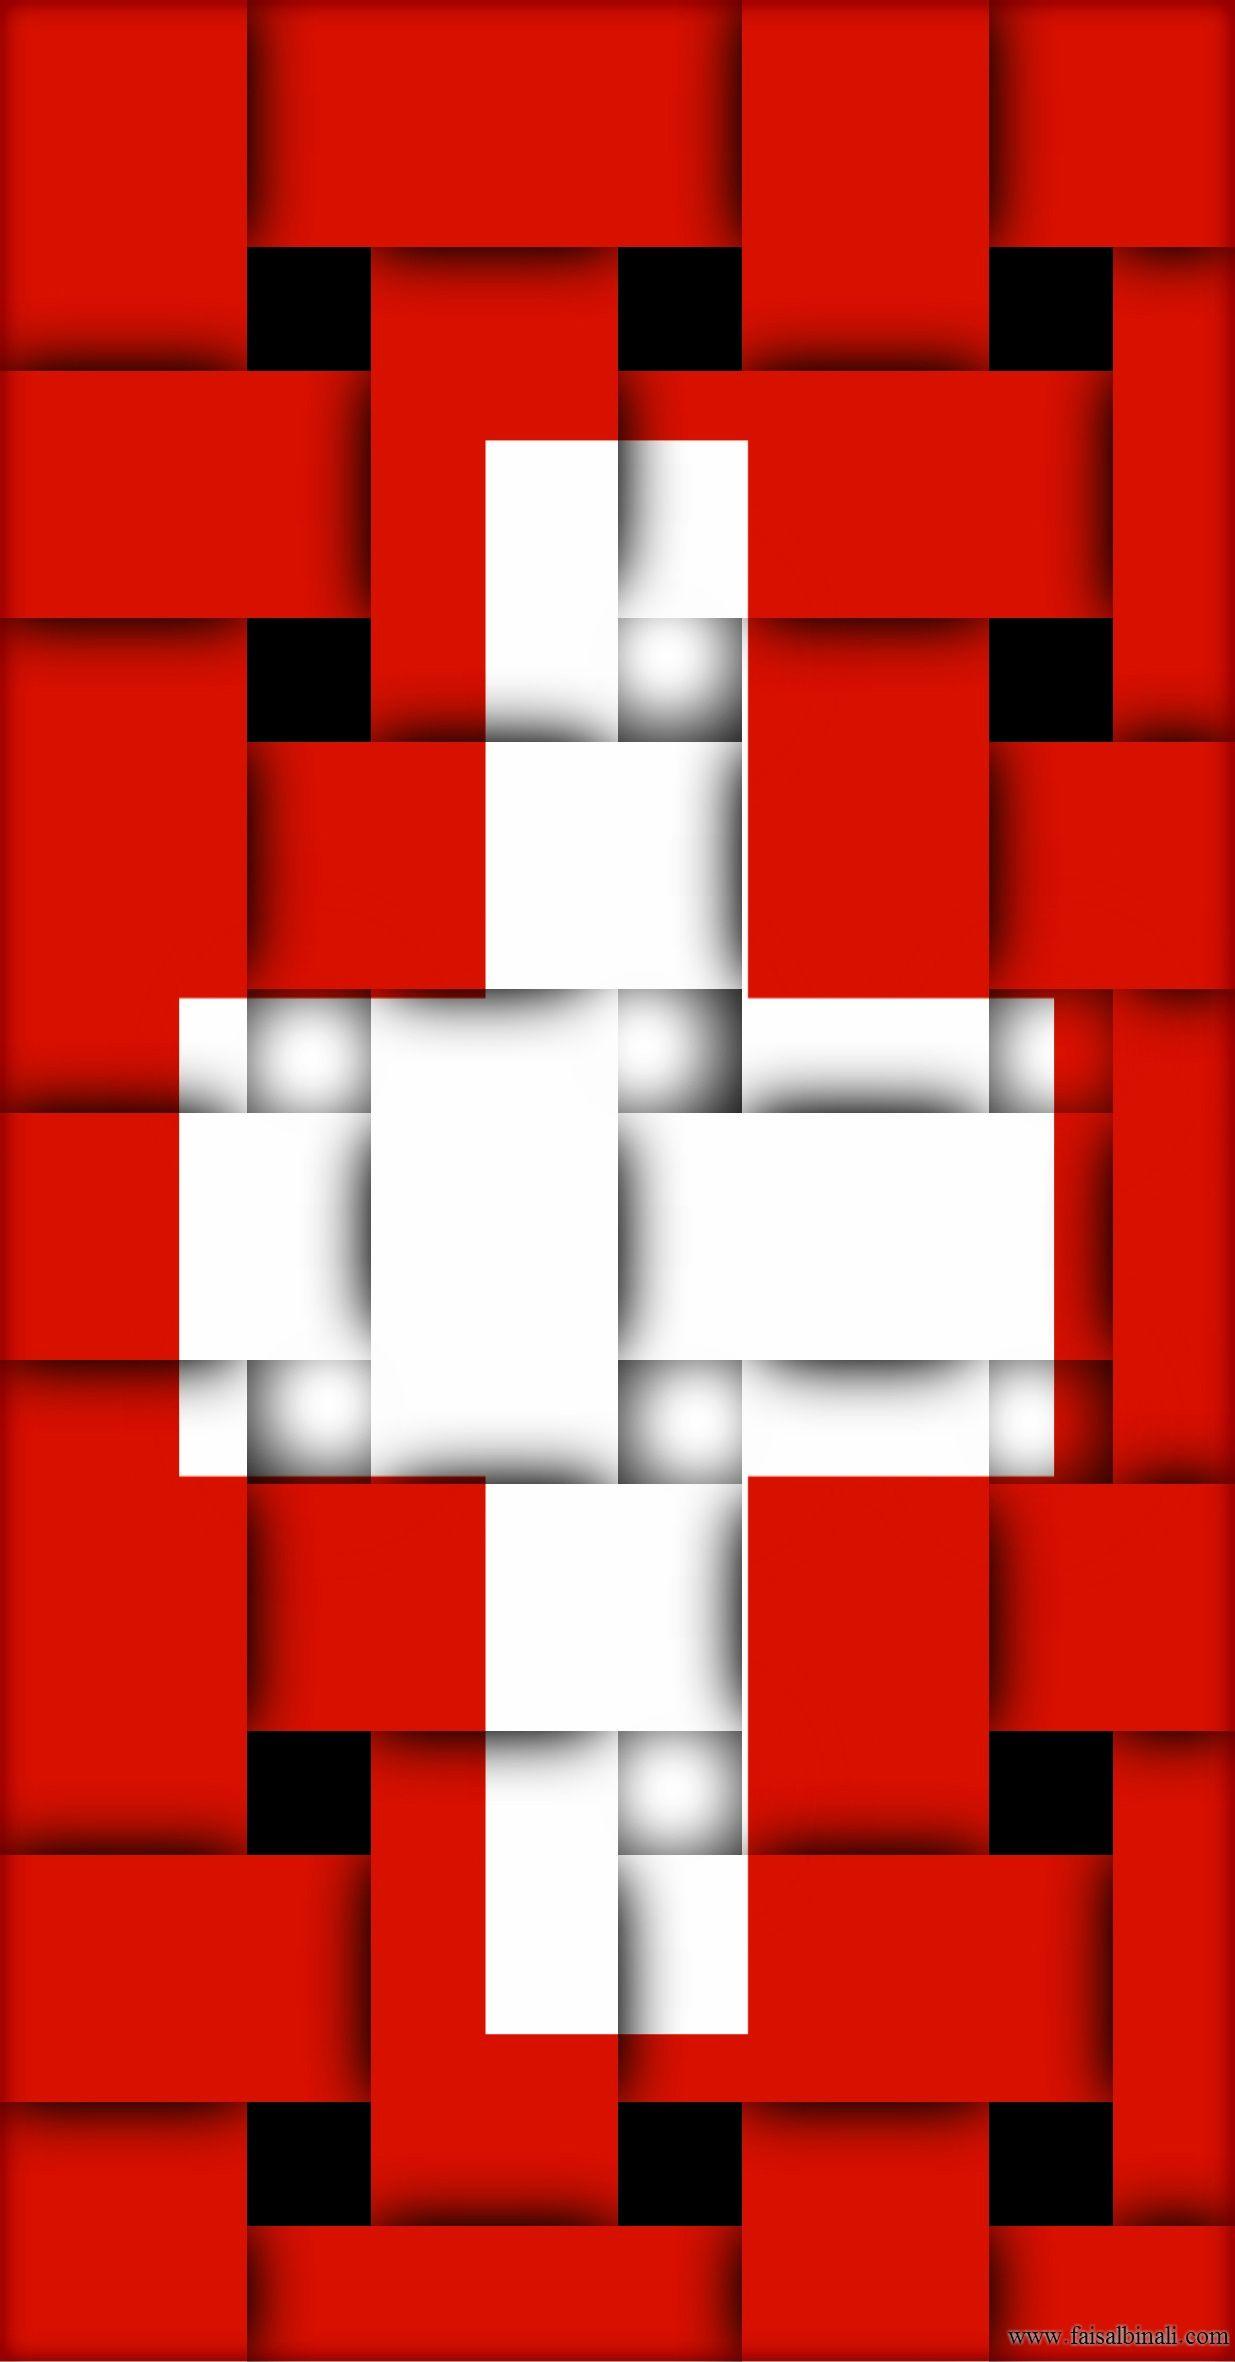 Switzerland Swiss Flag Hd Wallpapers For Smartphones And Tablets Wallpaper S Artwork Smartphone